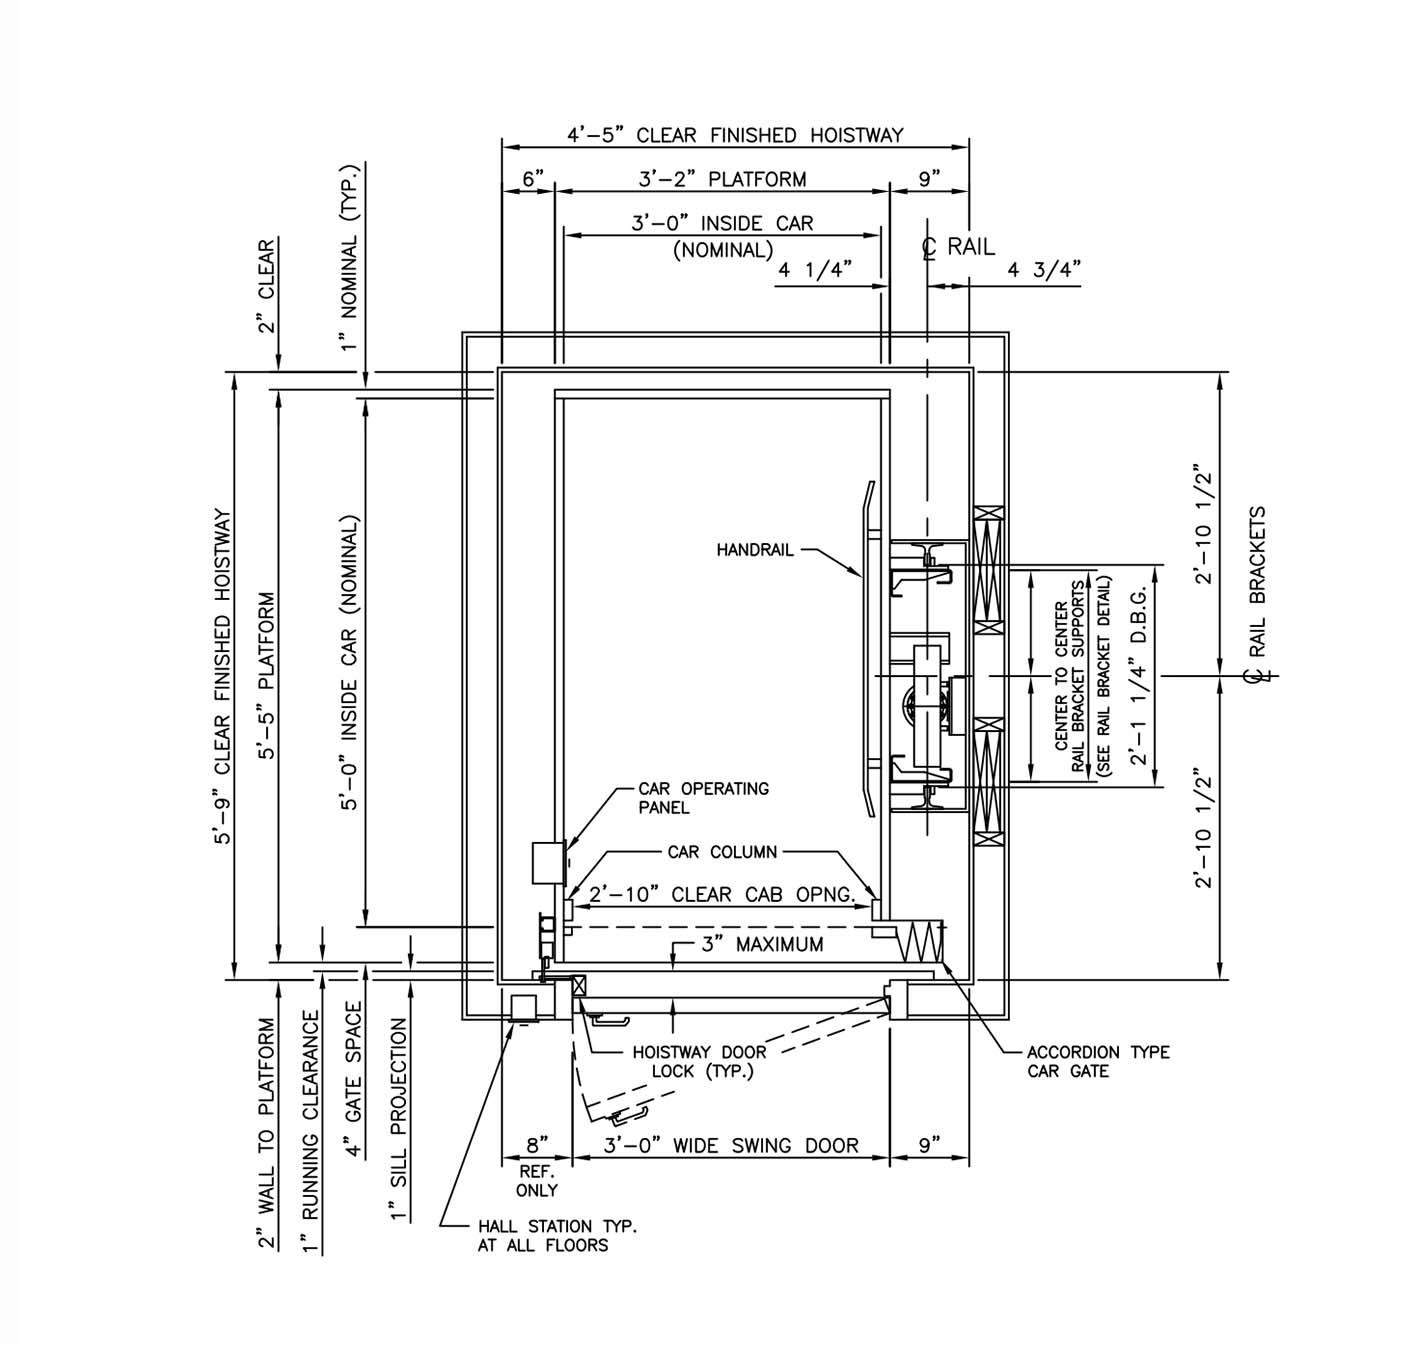 Hydraulic drawings custom elevator for Elevator plan drawing